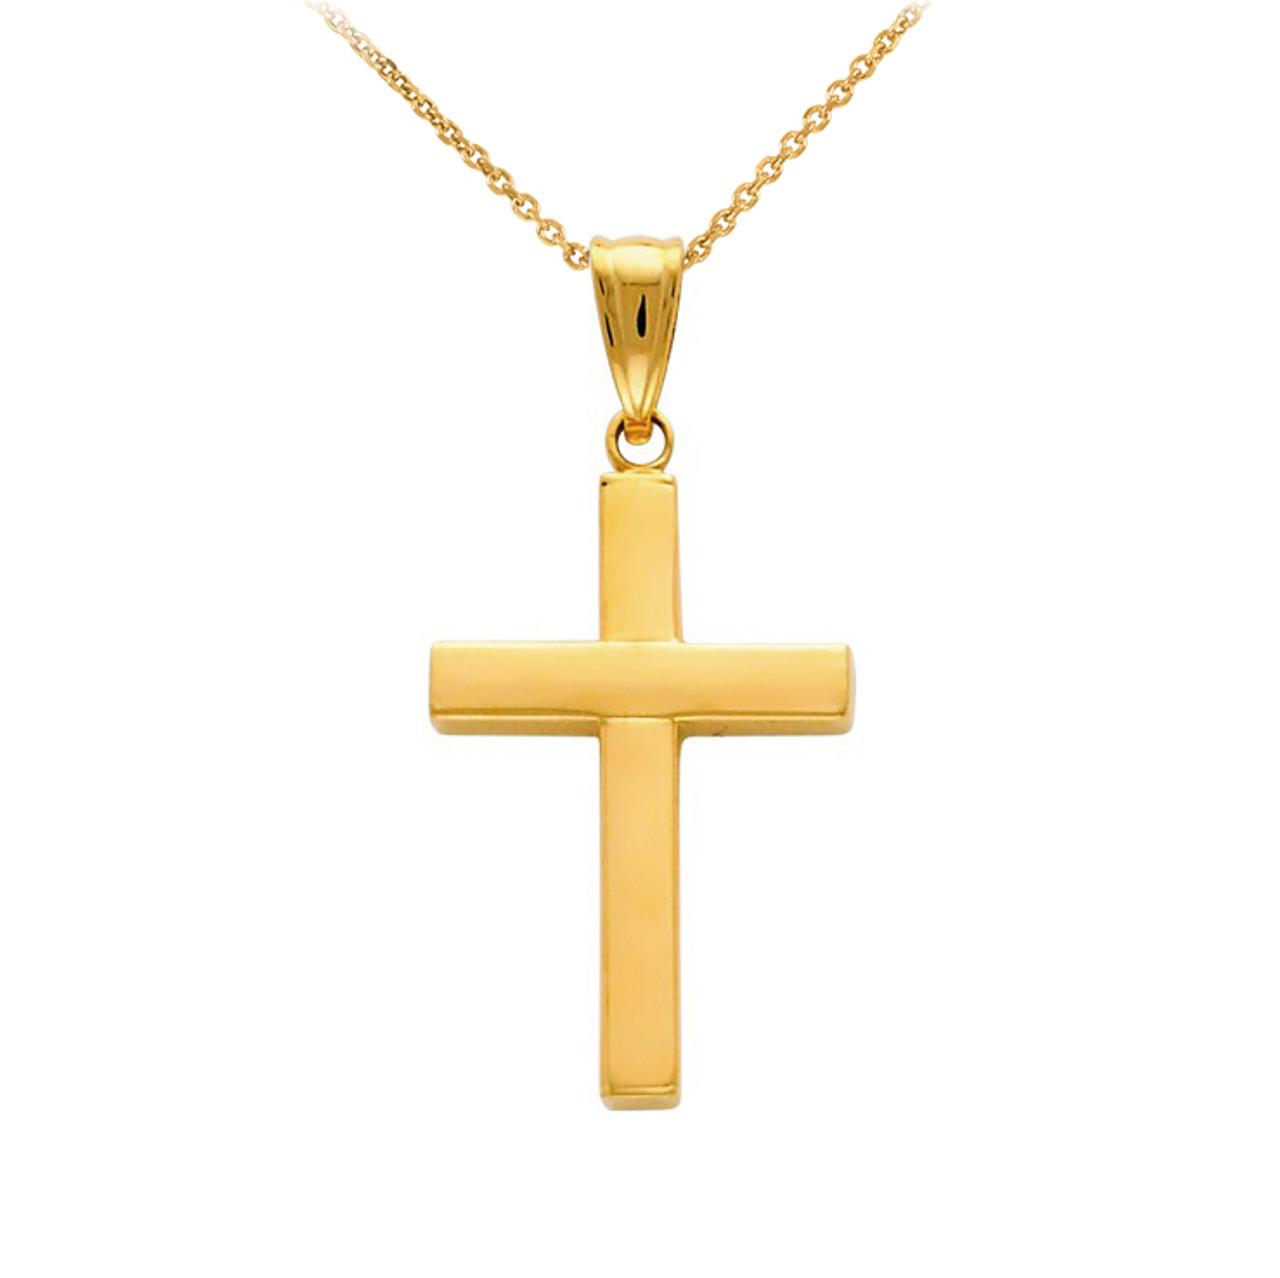 14k gold pendant cross 14k gold cross pendant necklace aloadofball Images